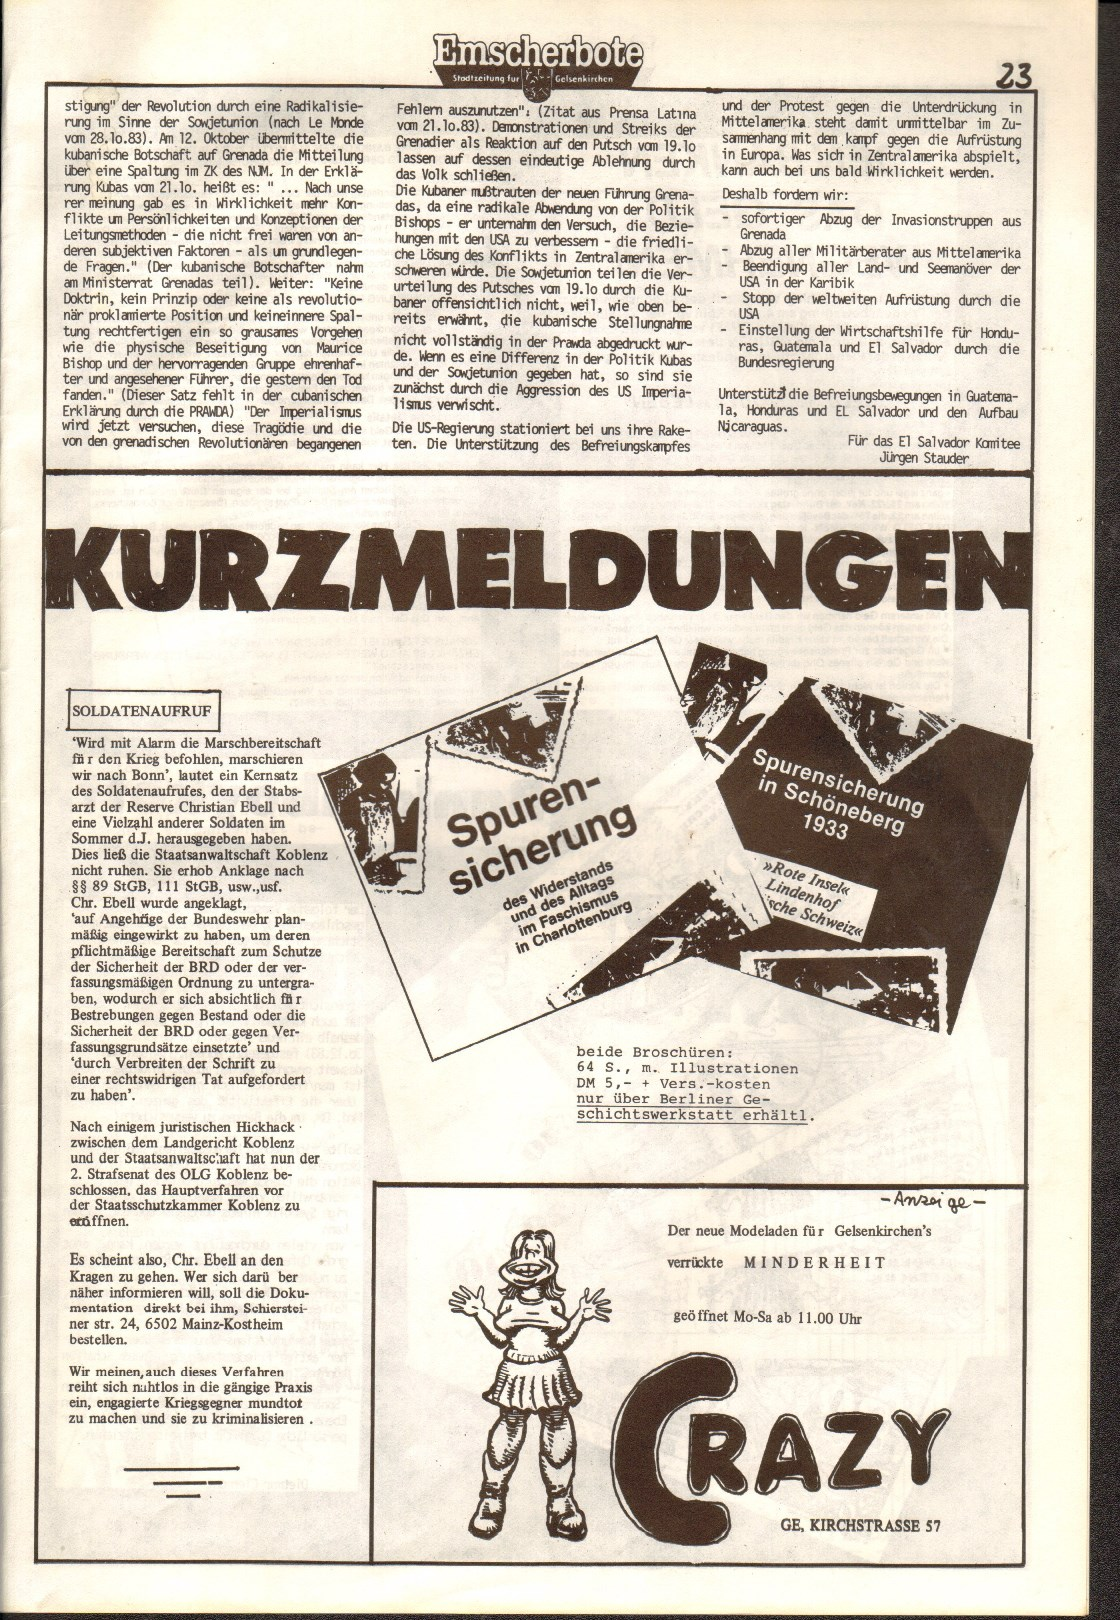 Gelsenkirchen_Emscherbote_1983_34_23